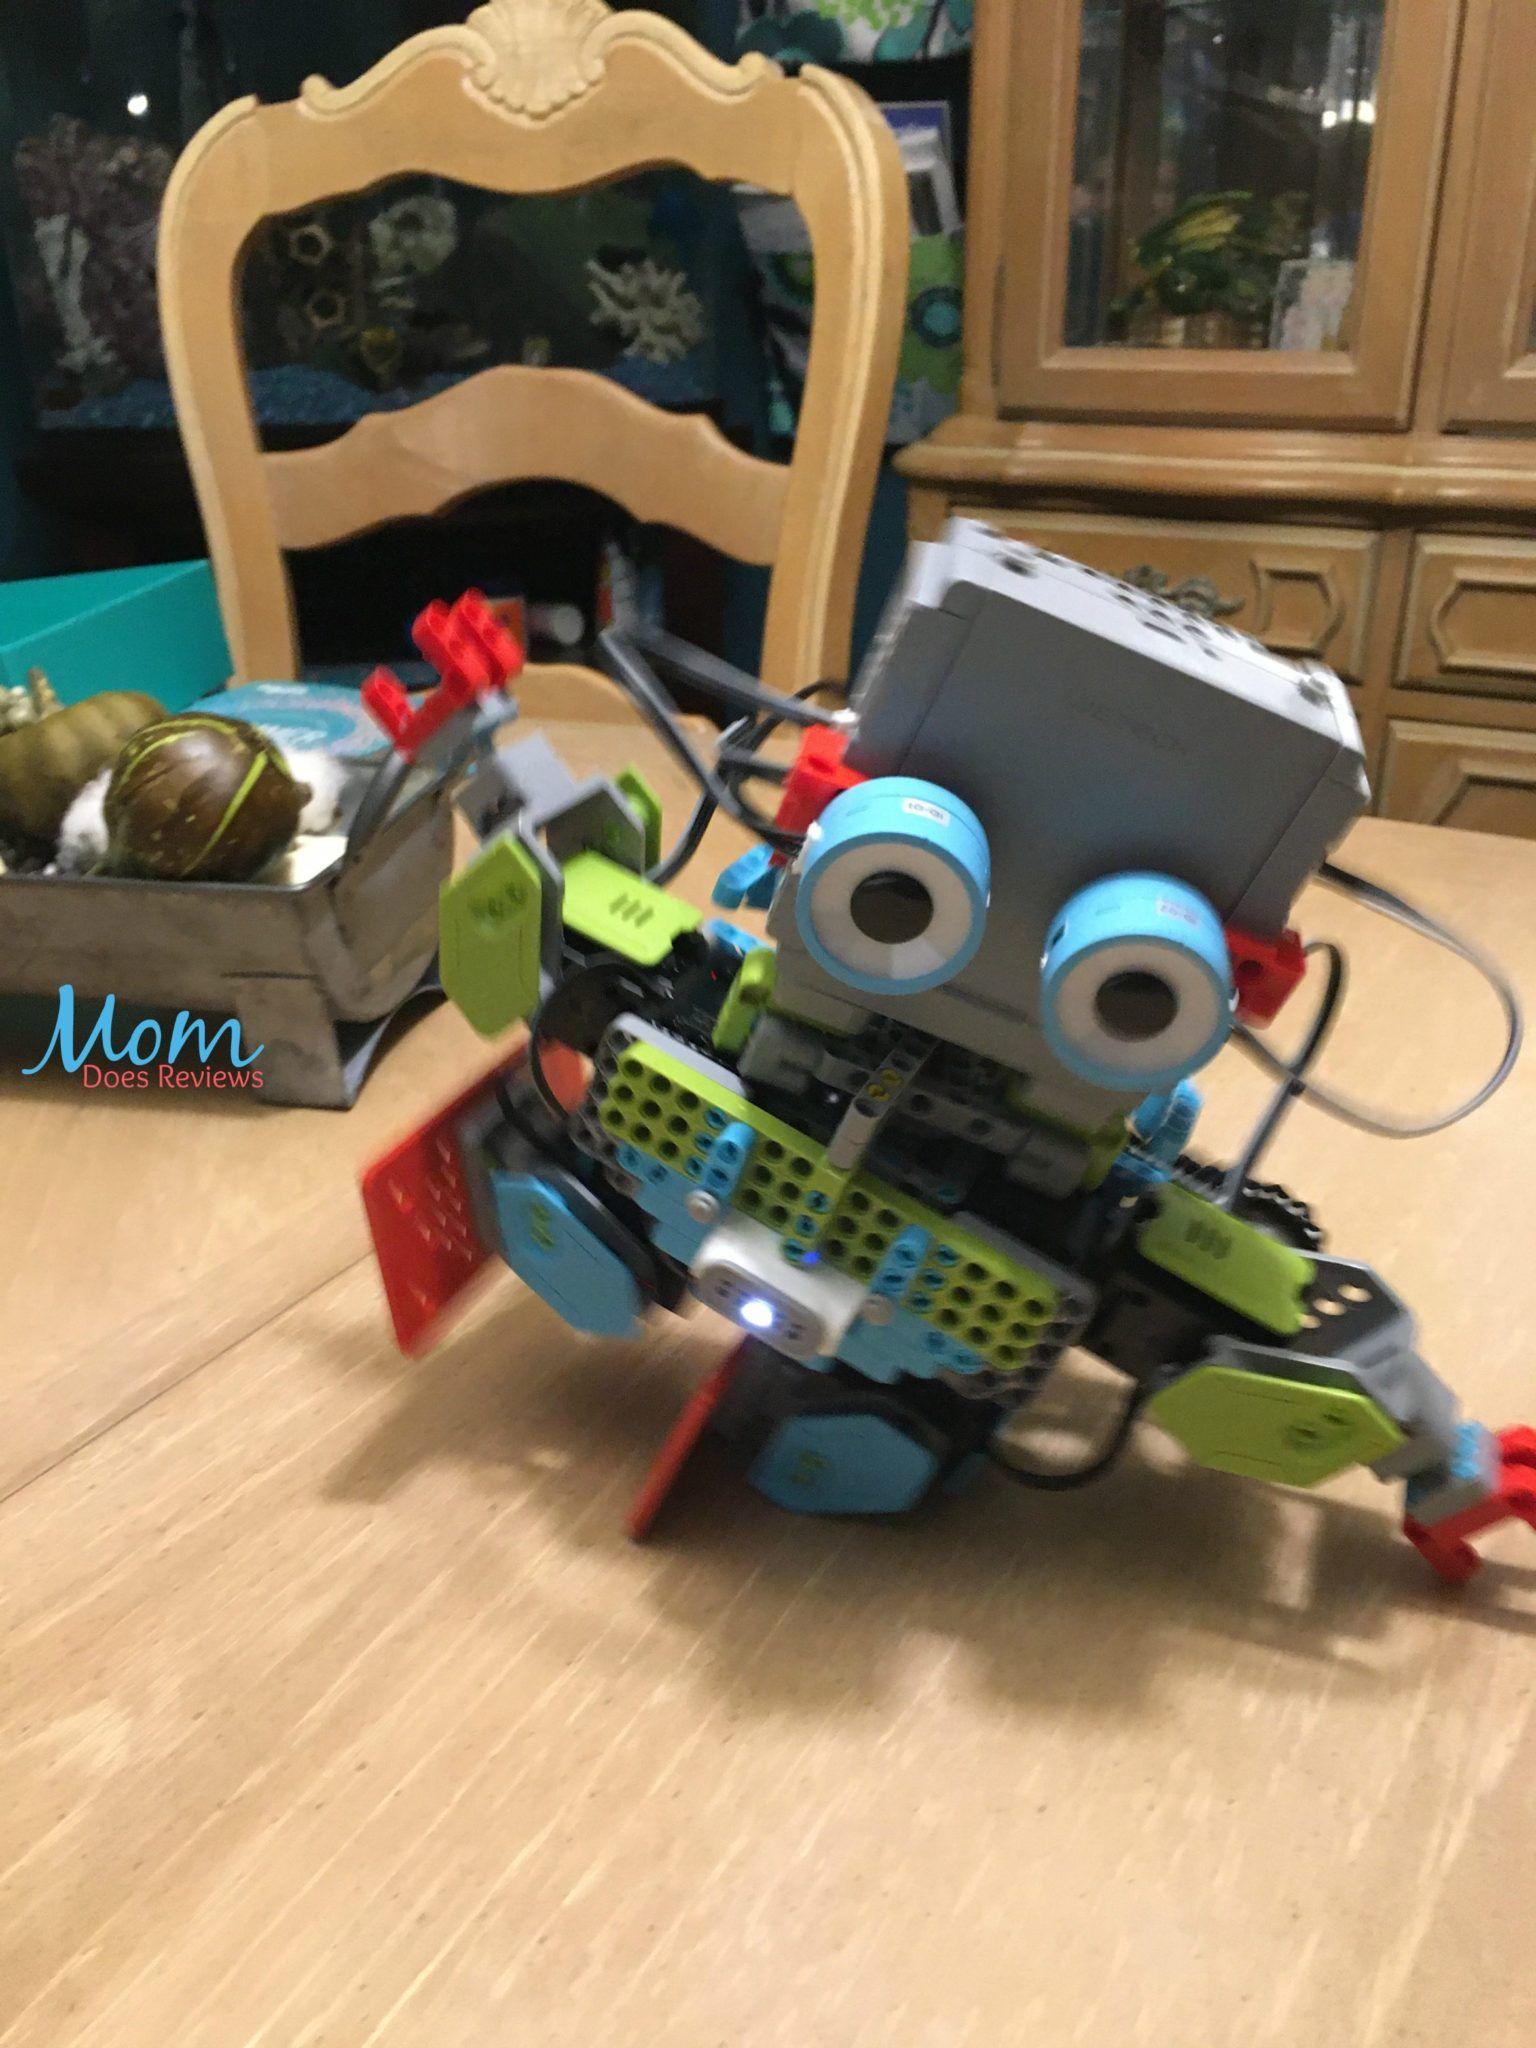 Jimu robot fun to build code and play megachristmas19